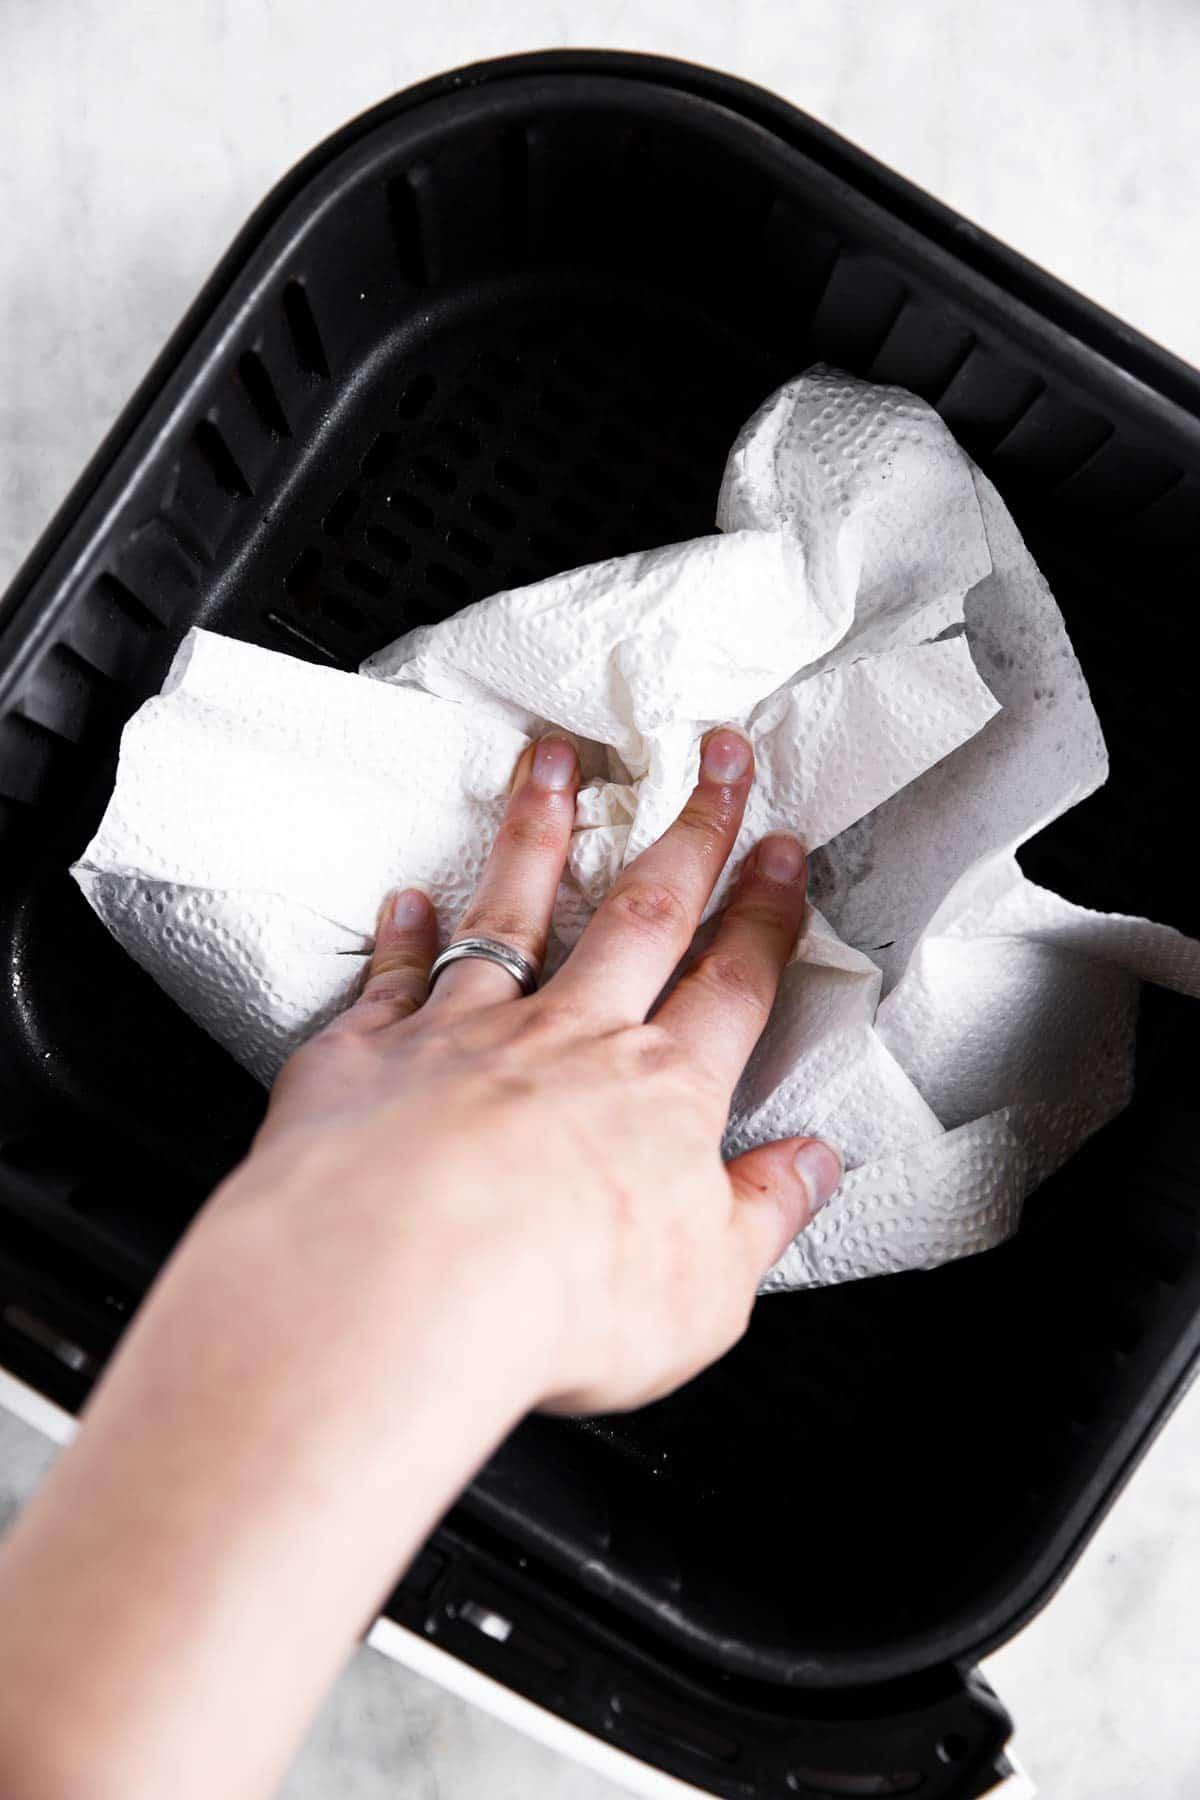 female hand wiping air fryer basket